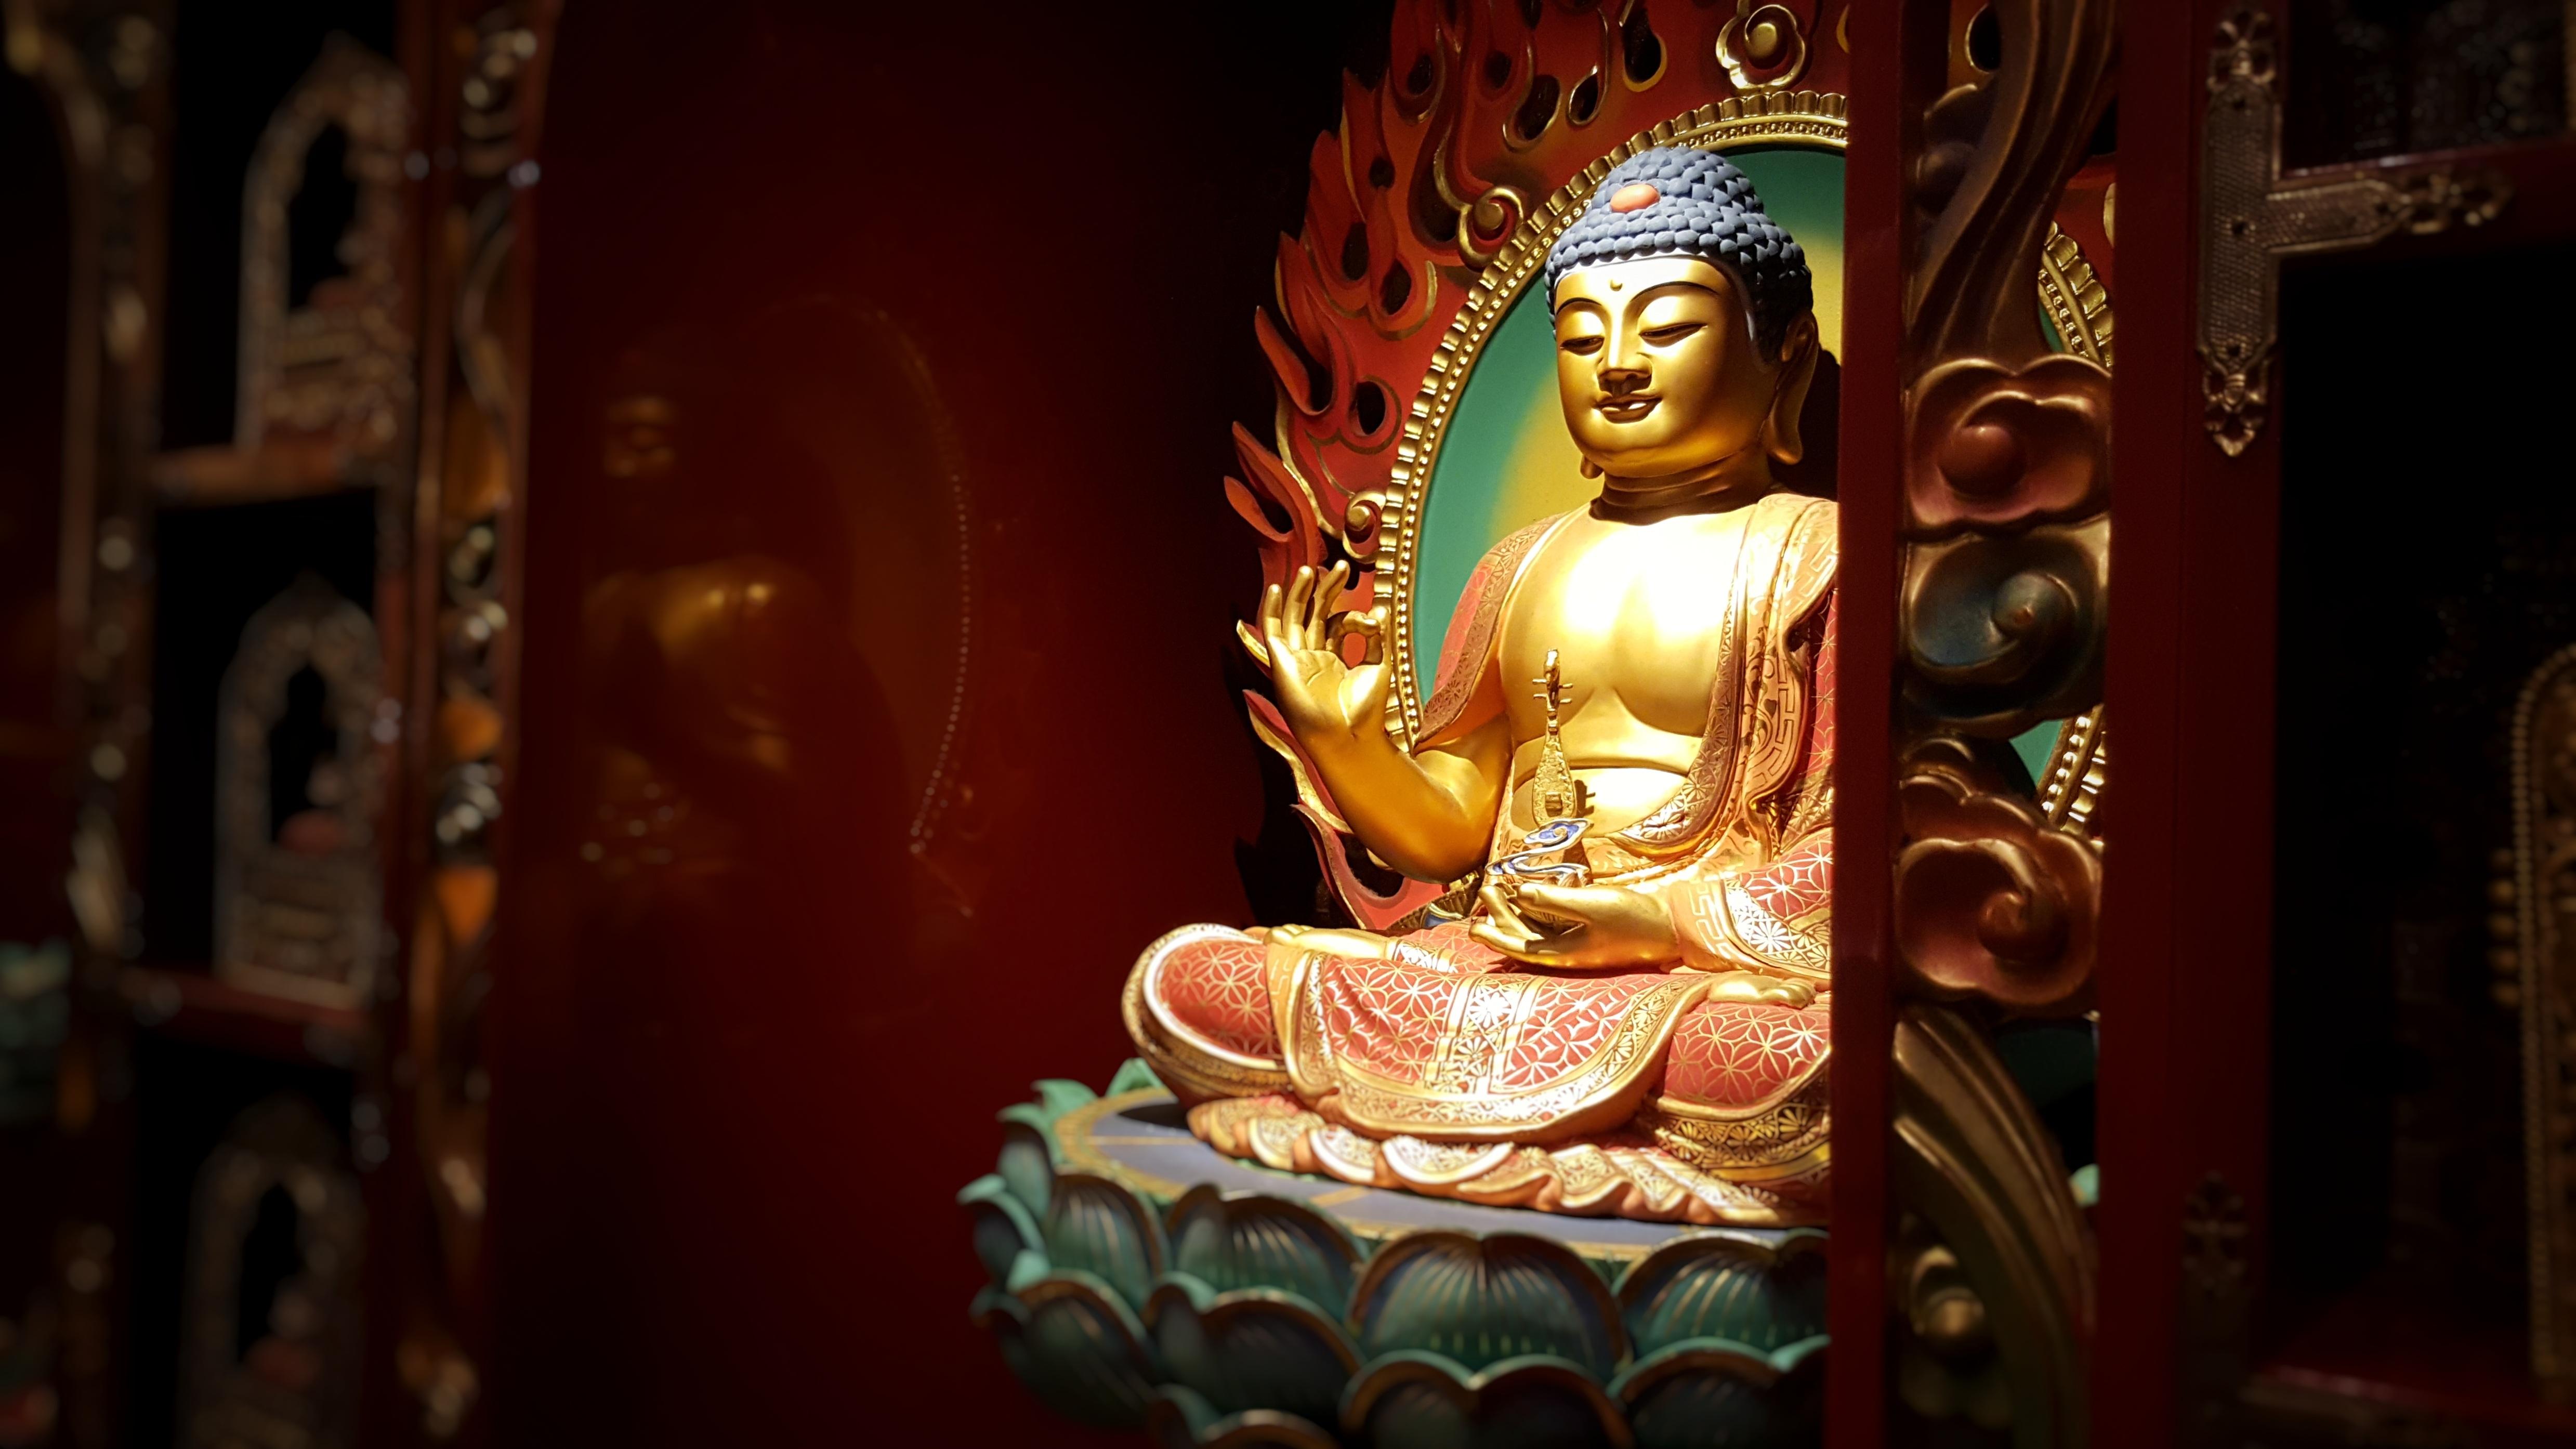 images feng shui - lefengshuifacile.com - Bouddha d'or zen